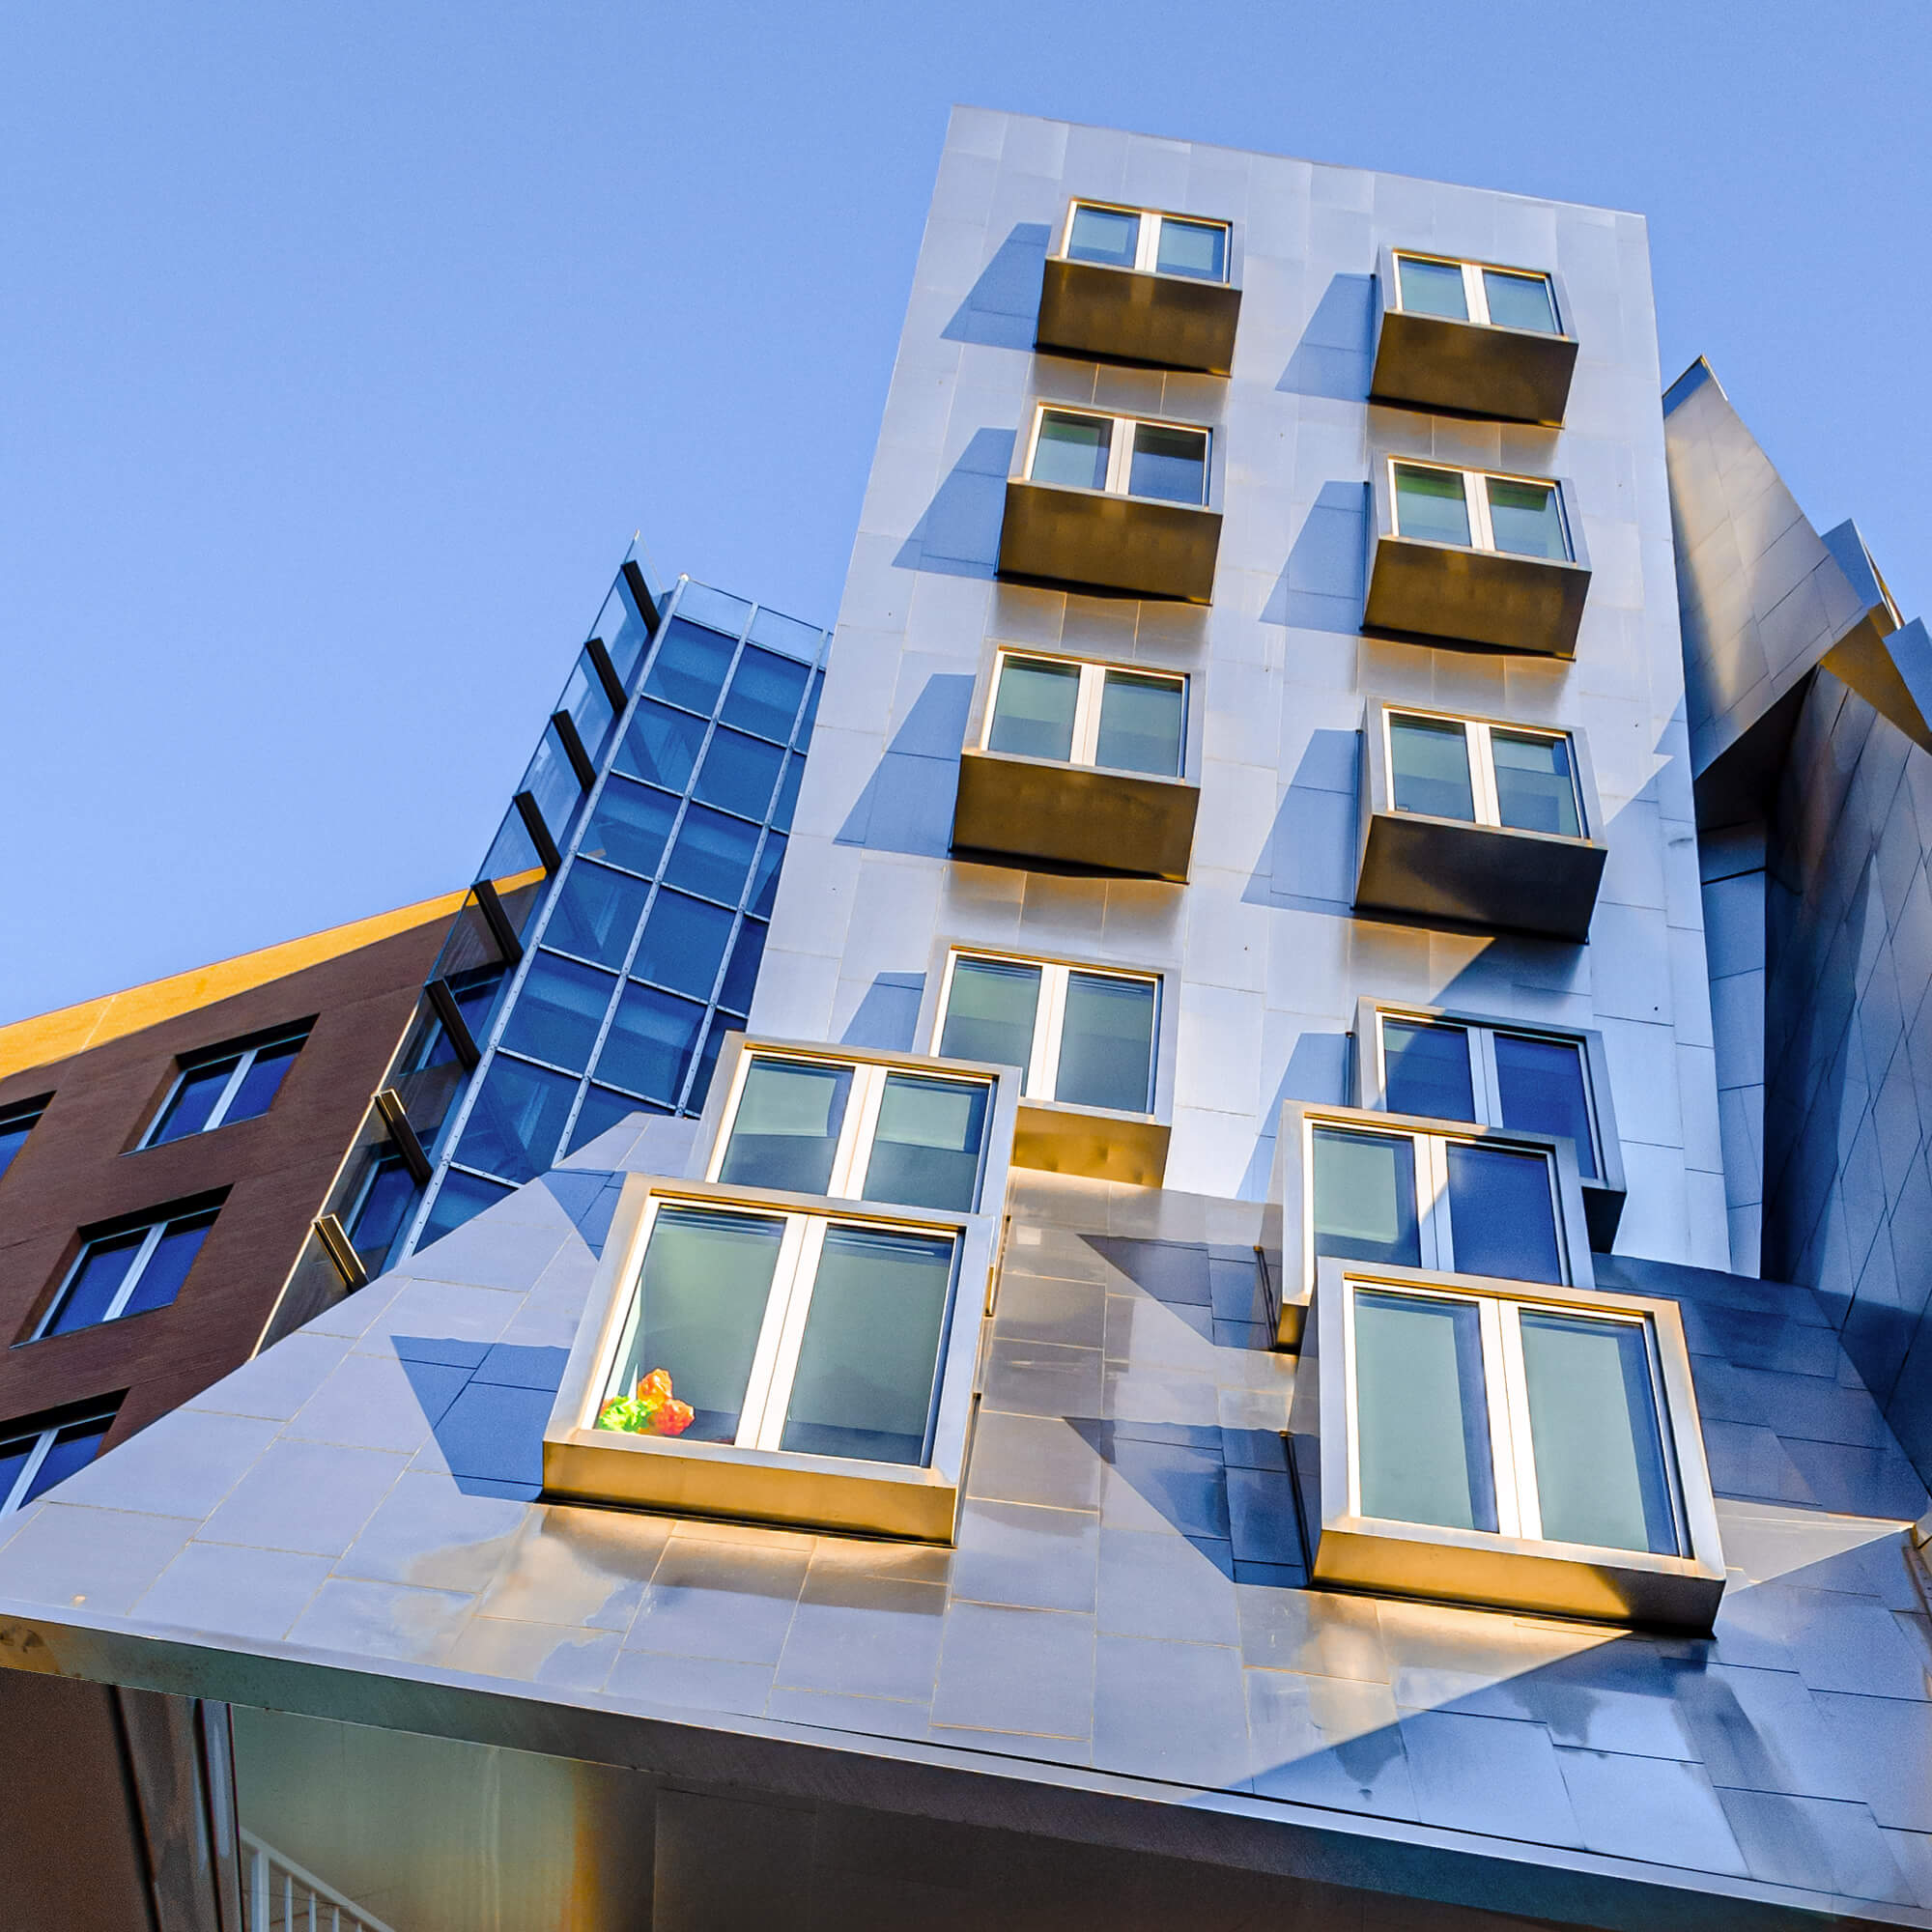 architecture photographie photographe paris Come bocabeille studio cob photo frank gehry ray and maria stata center cambridge